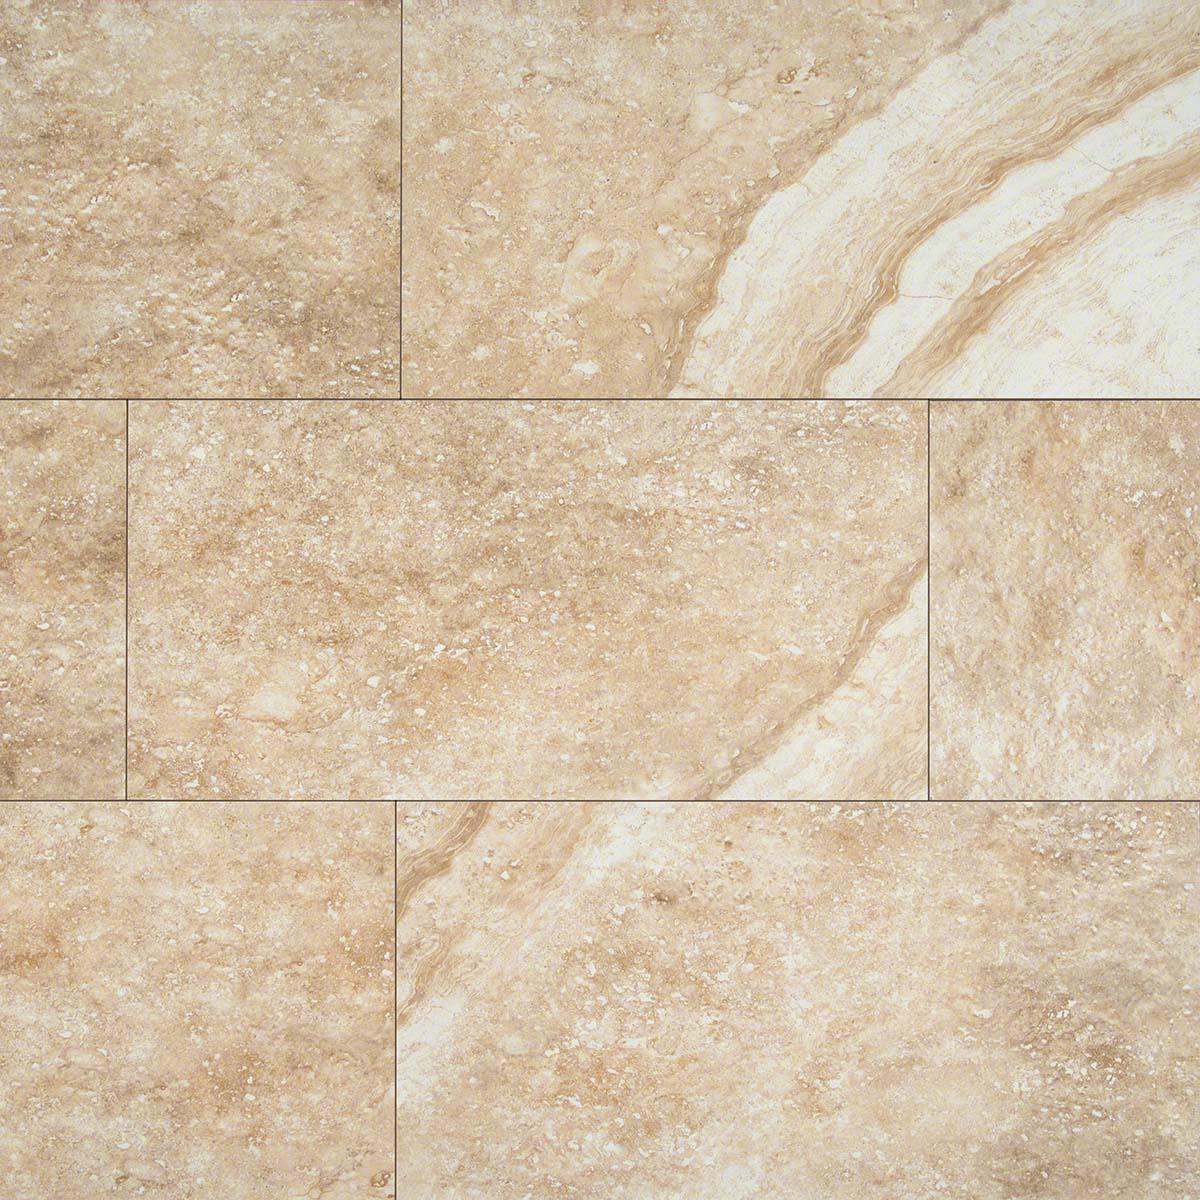 Bergamo Gris 12X24 Matte Ceramic Floor and Wall Tile